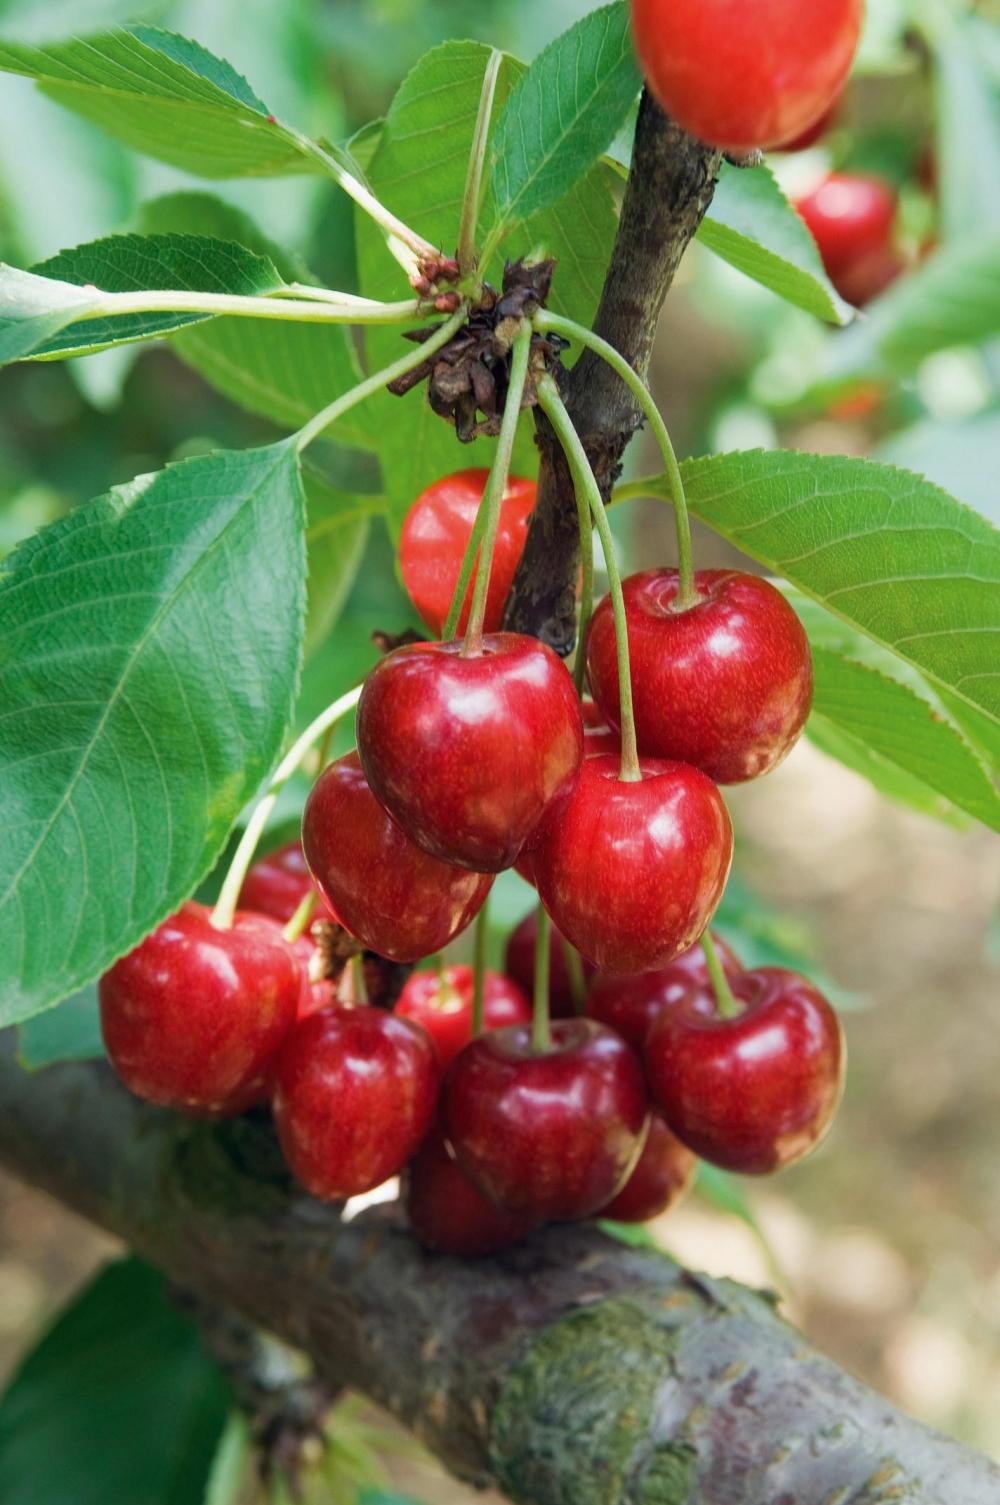 Arbre fruitier quelle forme choisir for Elenco alberi da frutto